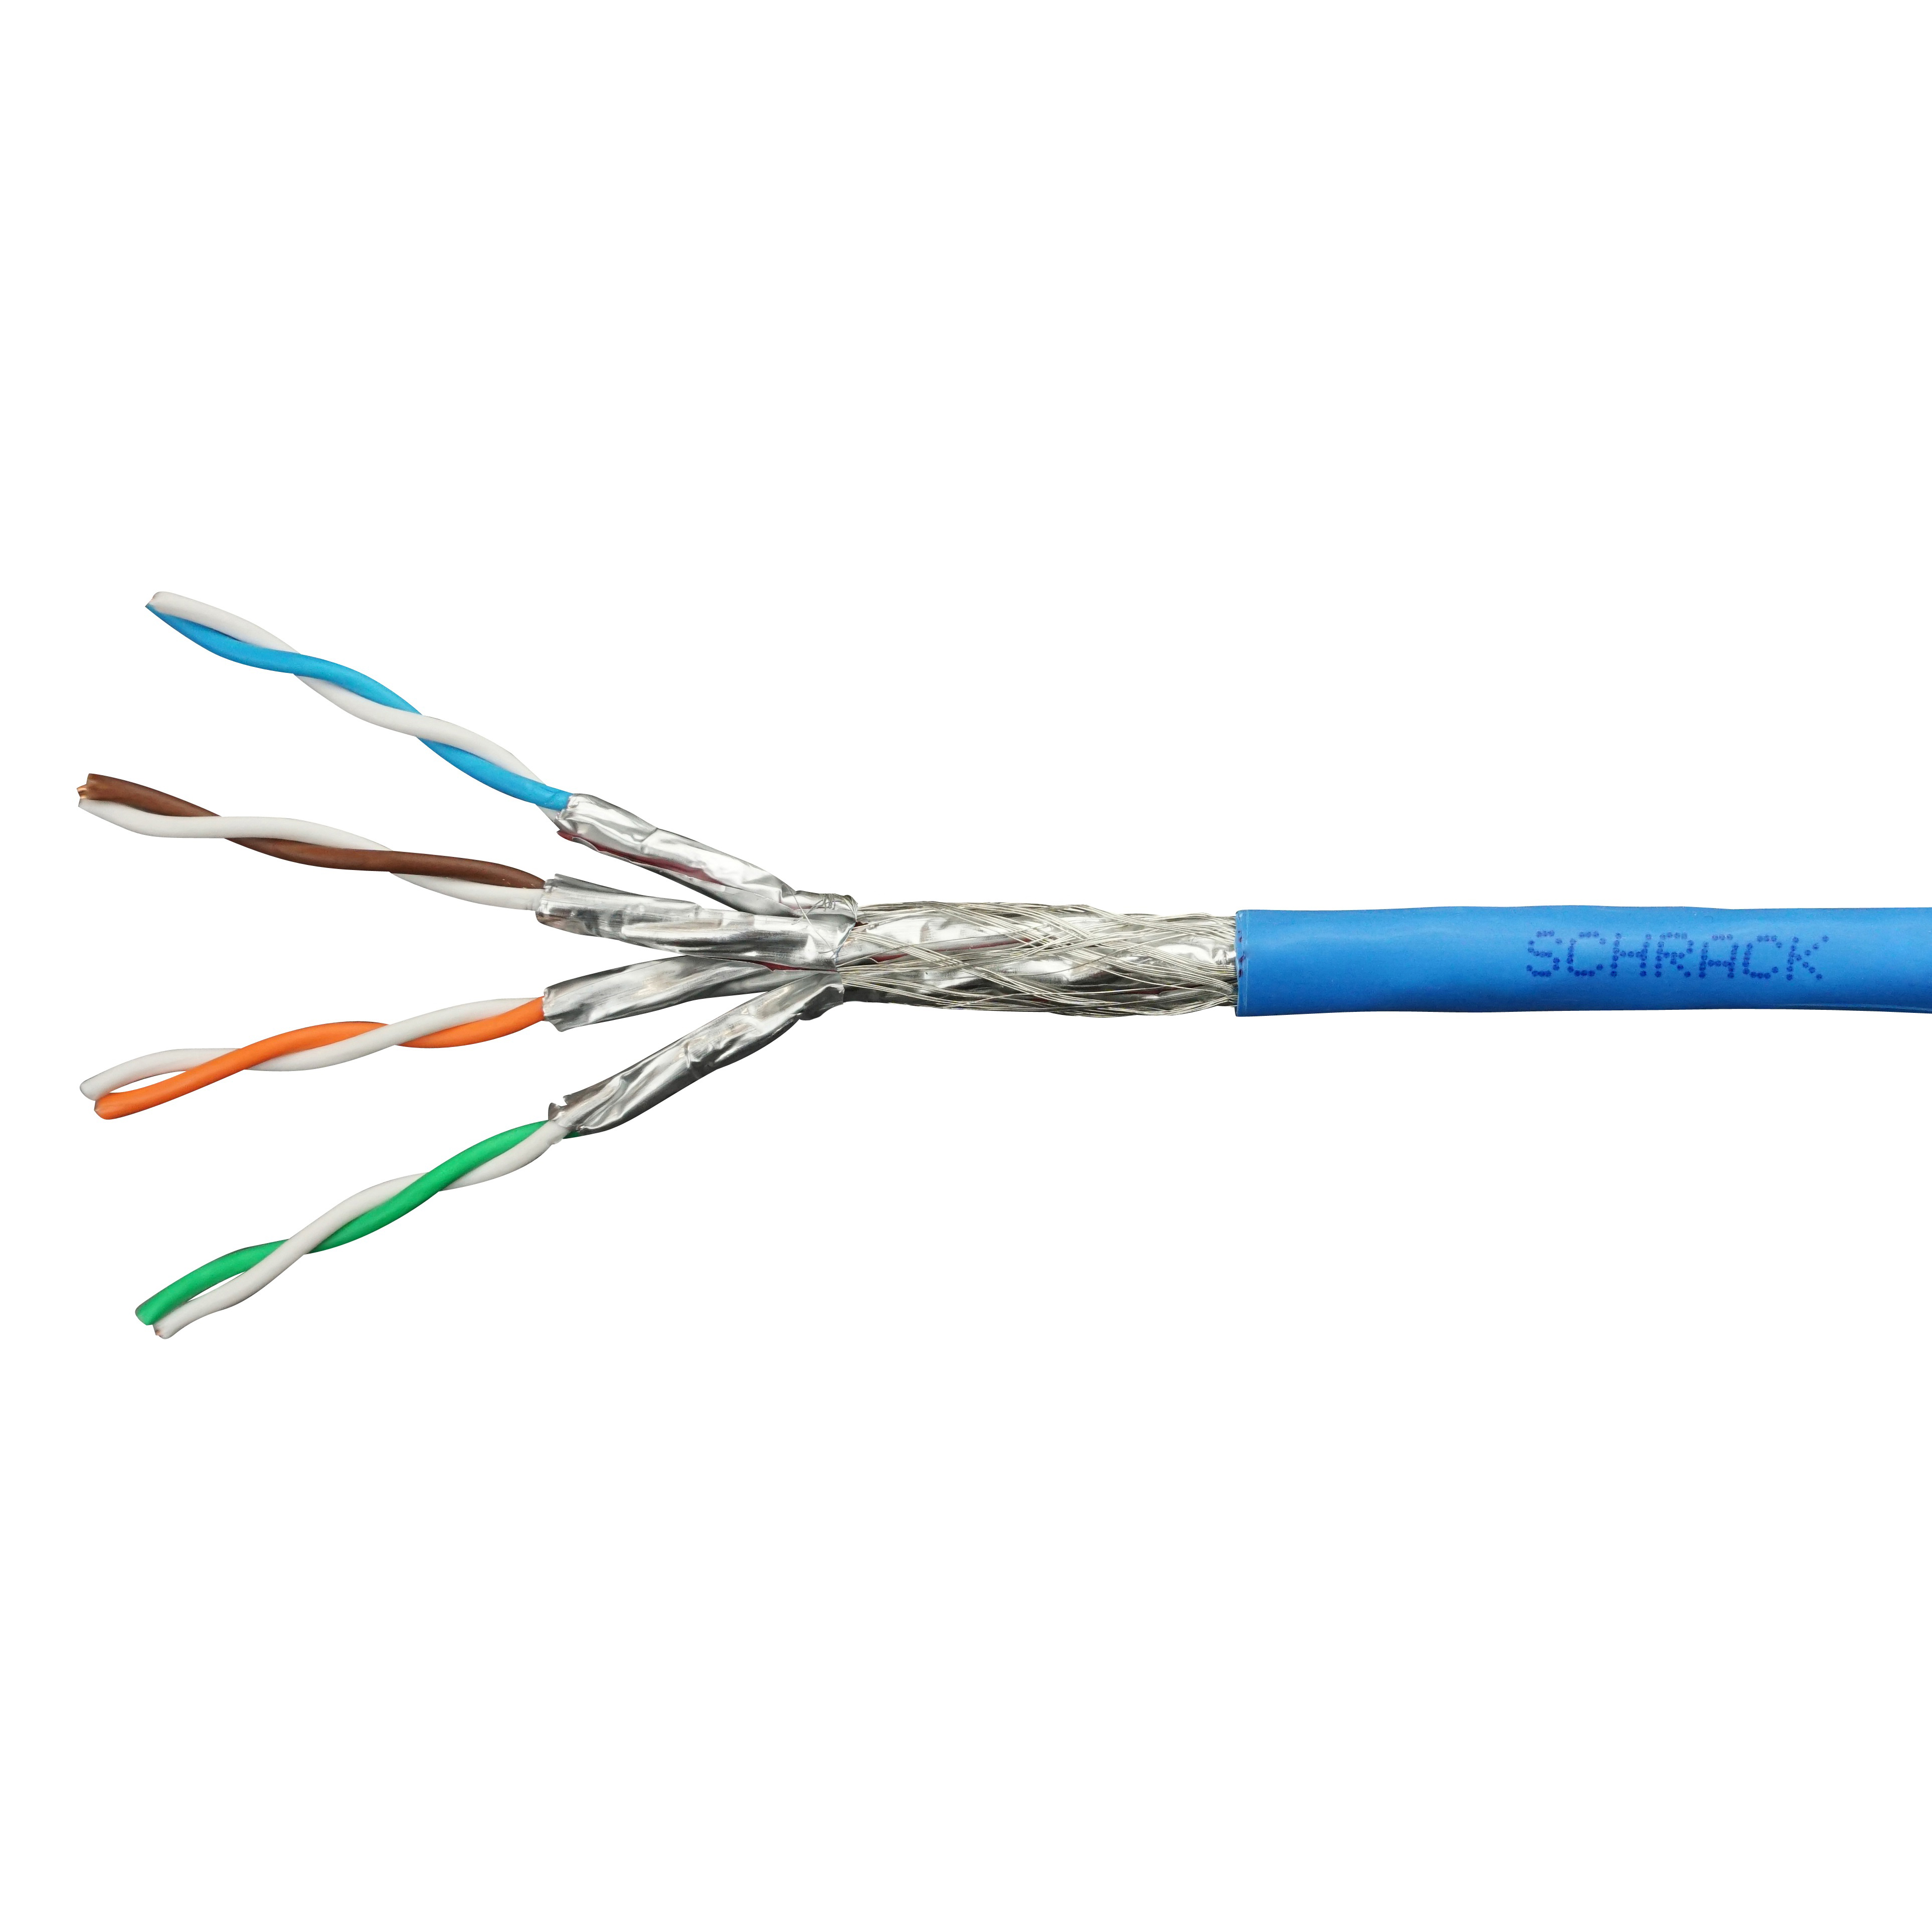 100 m S/FTP Kabel Cat.7, 4x2xAWG23/1, 1000Mhz, LS0H-3, 30%, blau HSEKP4233P